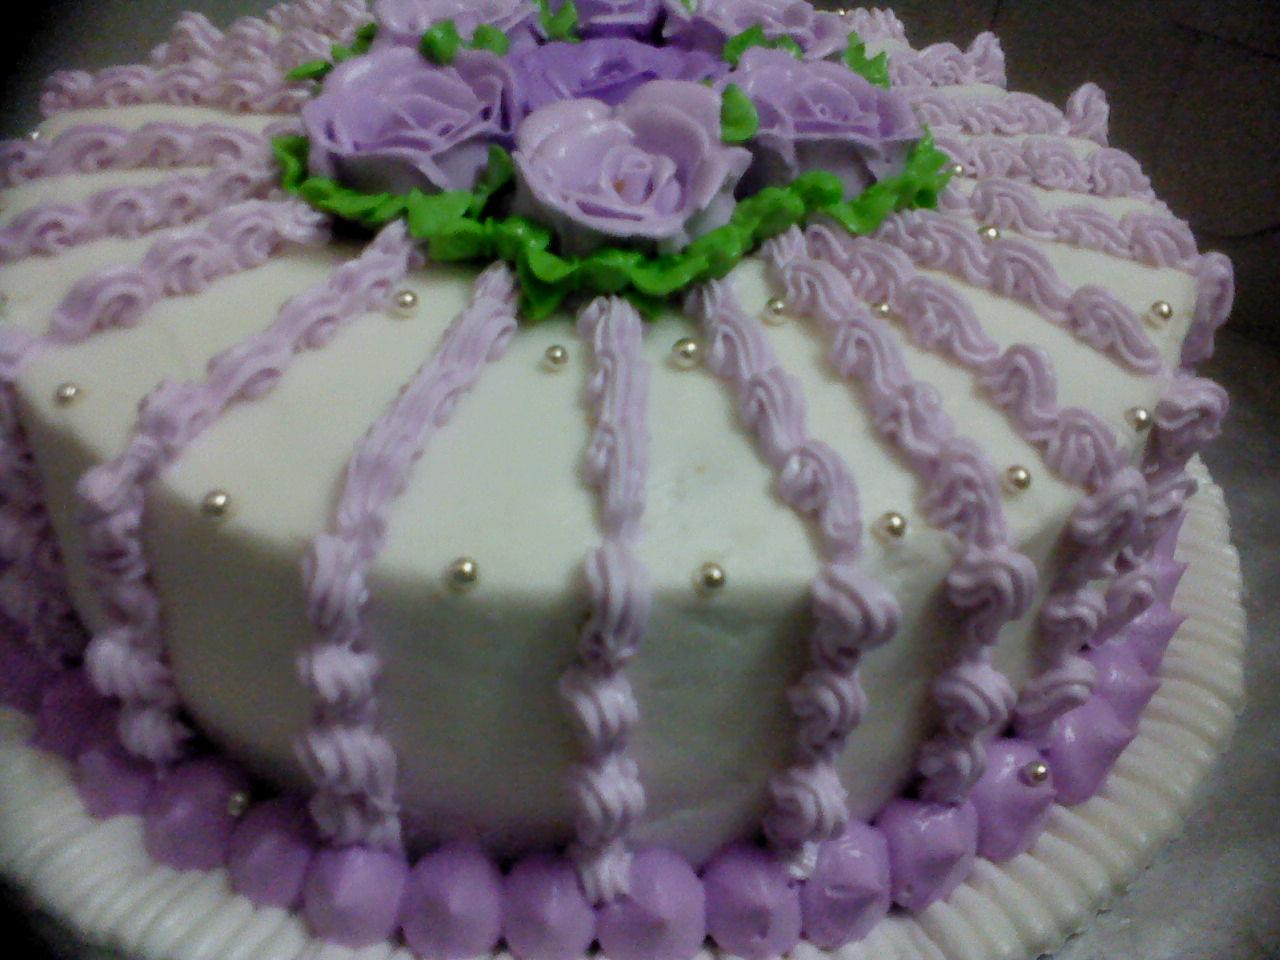 Balqisyia S Choc Shop Wedding Cake 2 Tier Purple Theme